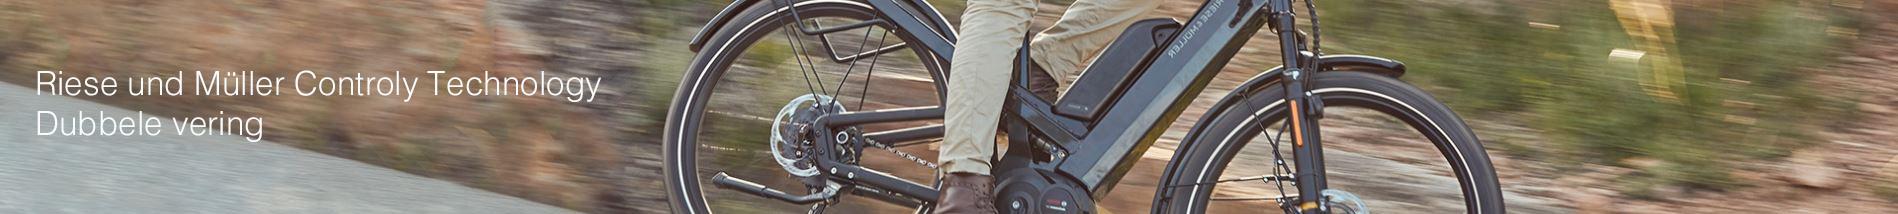 E-bikes dubbele vering